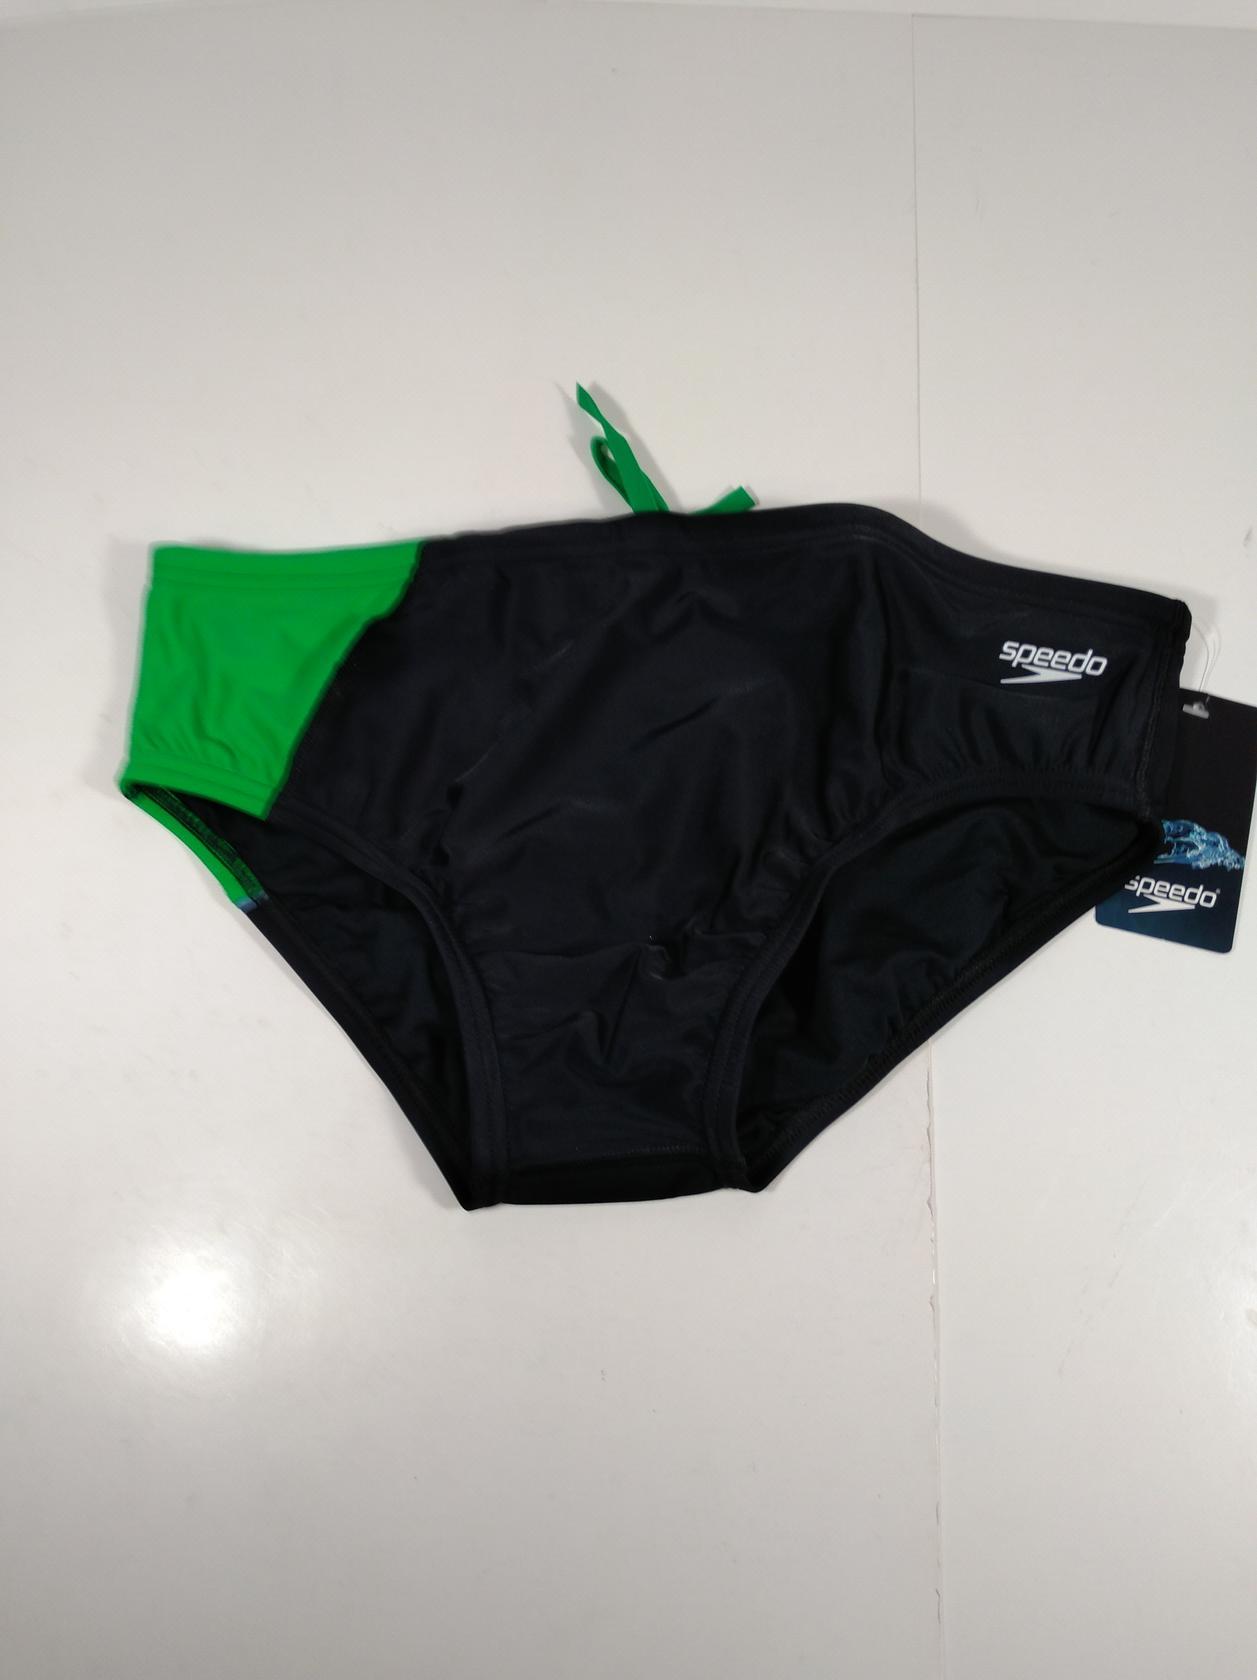 Speedo Mens Powerflex Eco Revolve Splice Brief Swimsuit